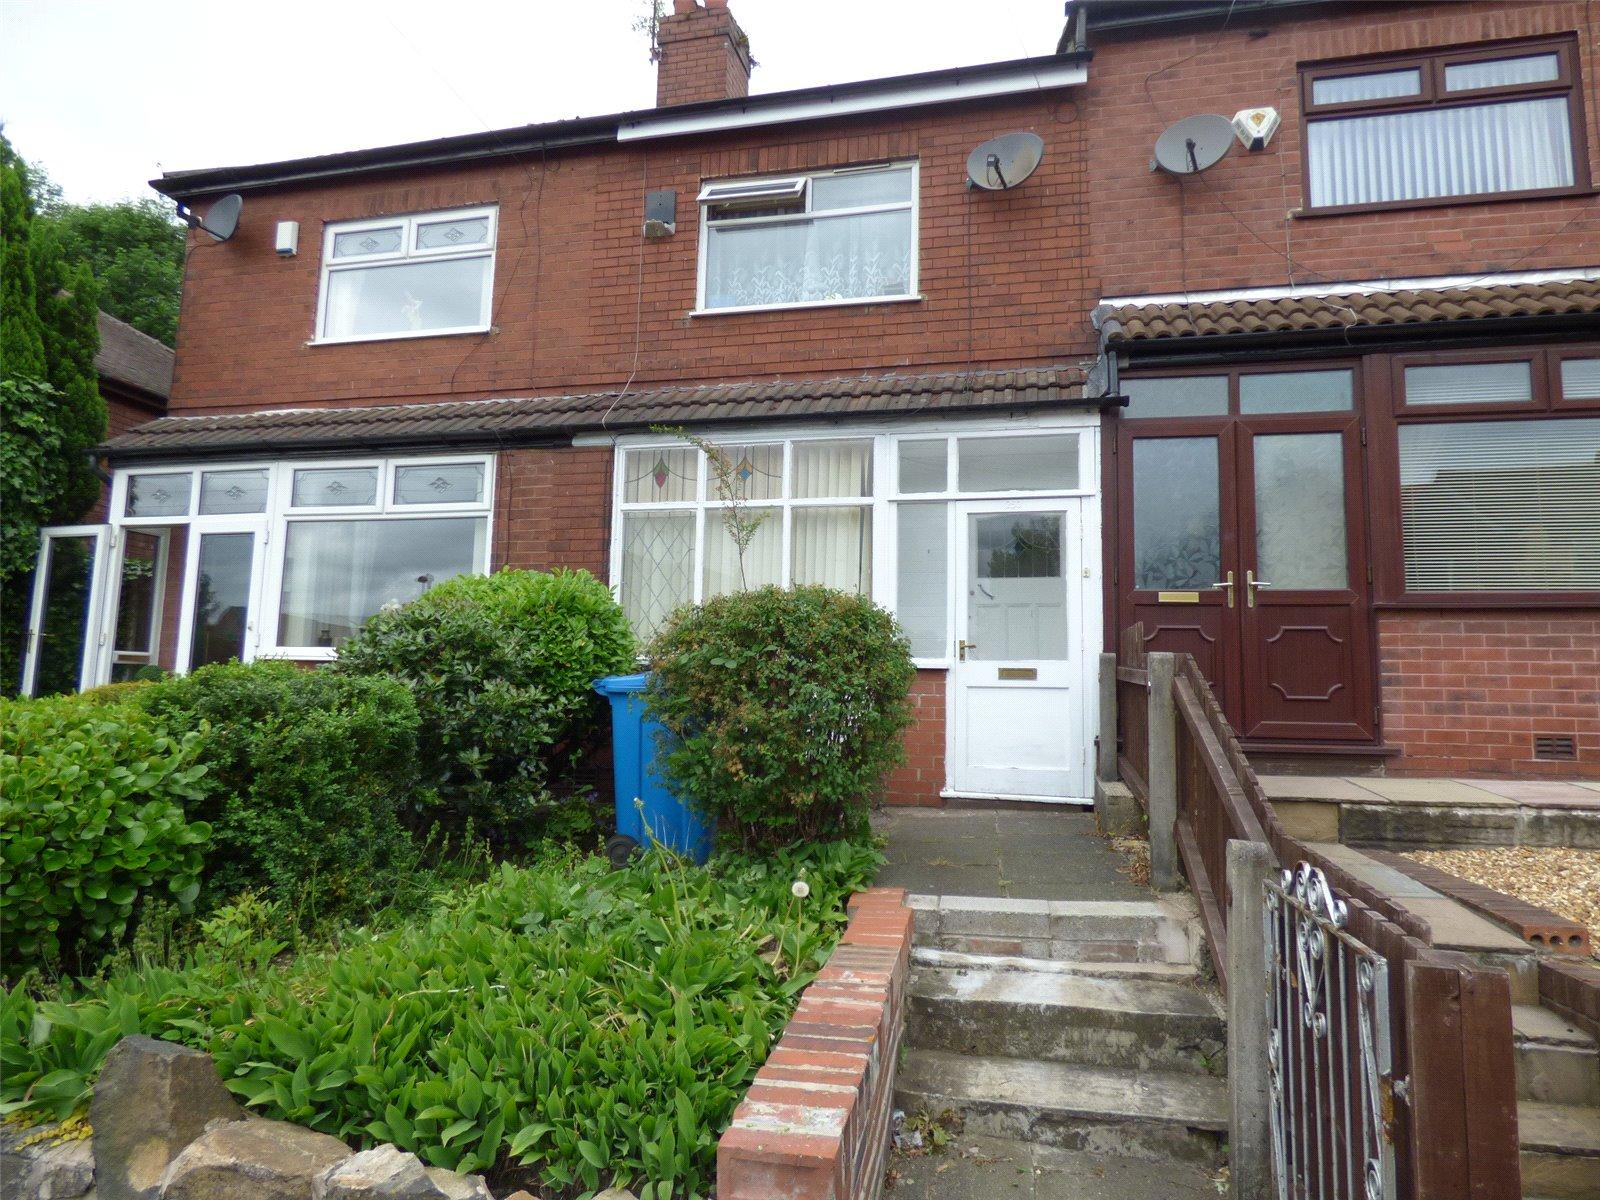 2 Bedrooms Terraced House for sale in Block Lane, Chadderton, Oldham, OL9